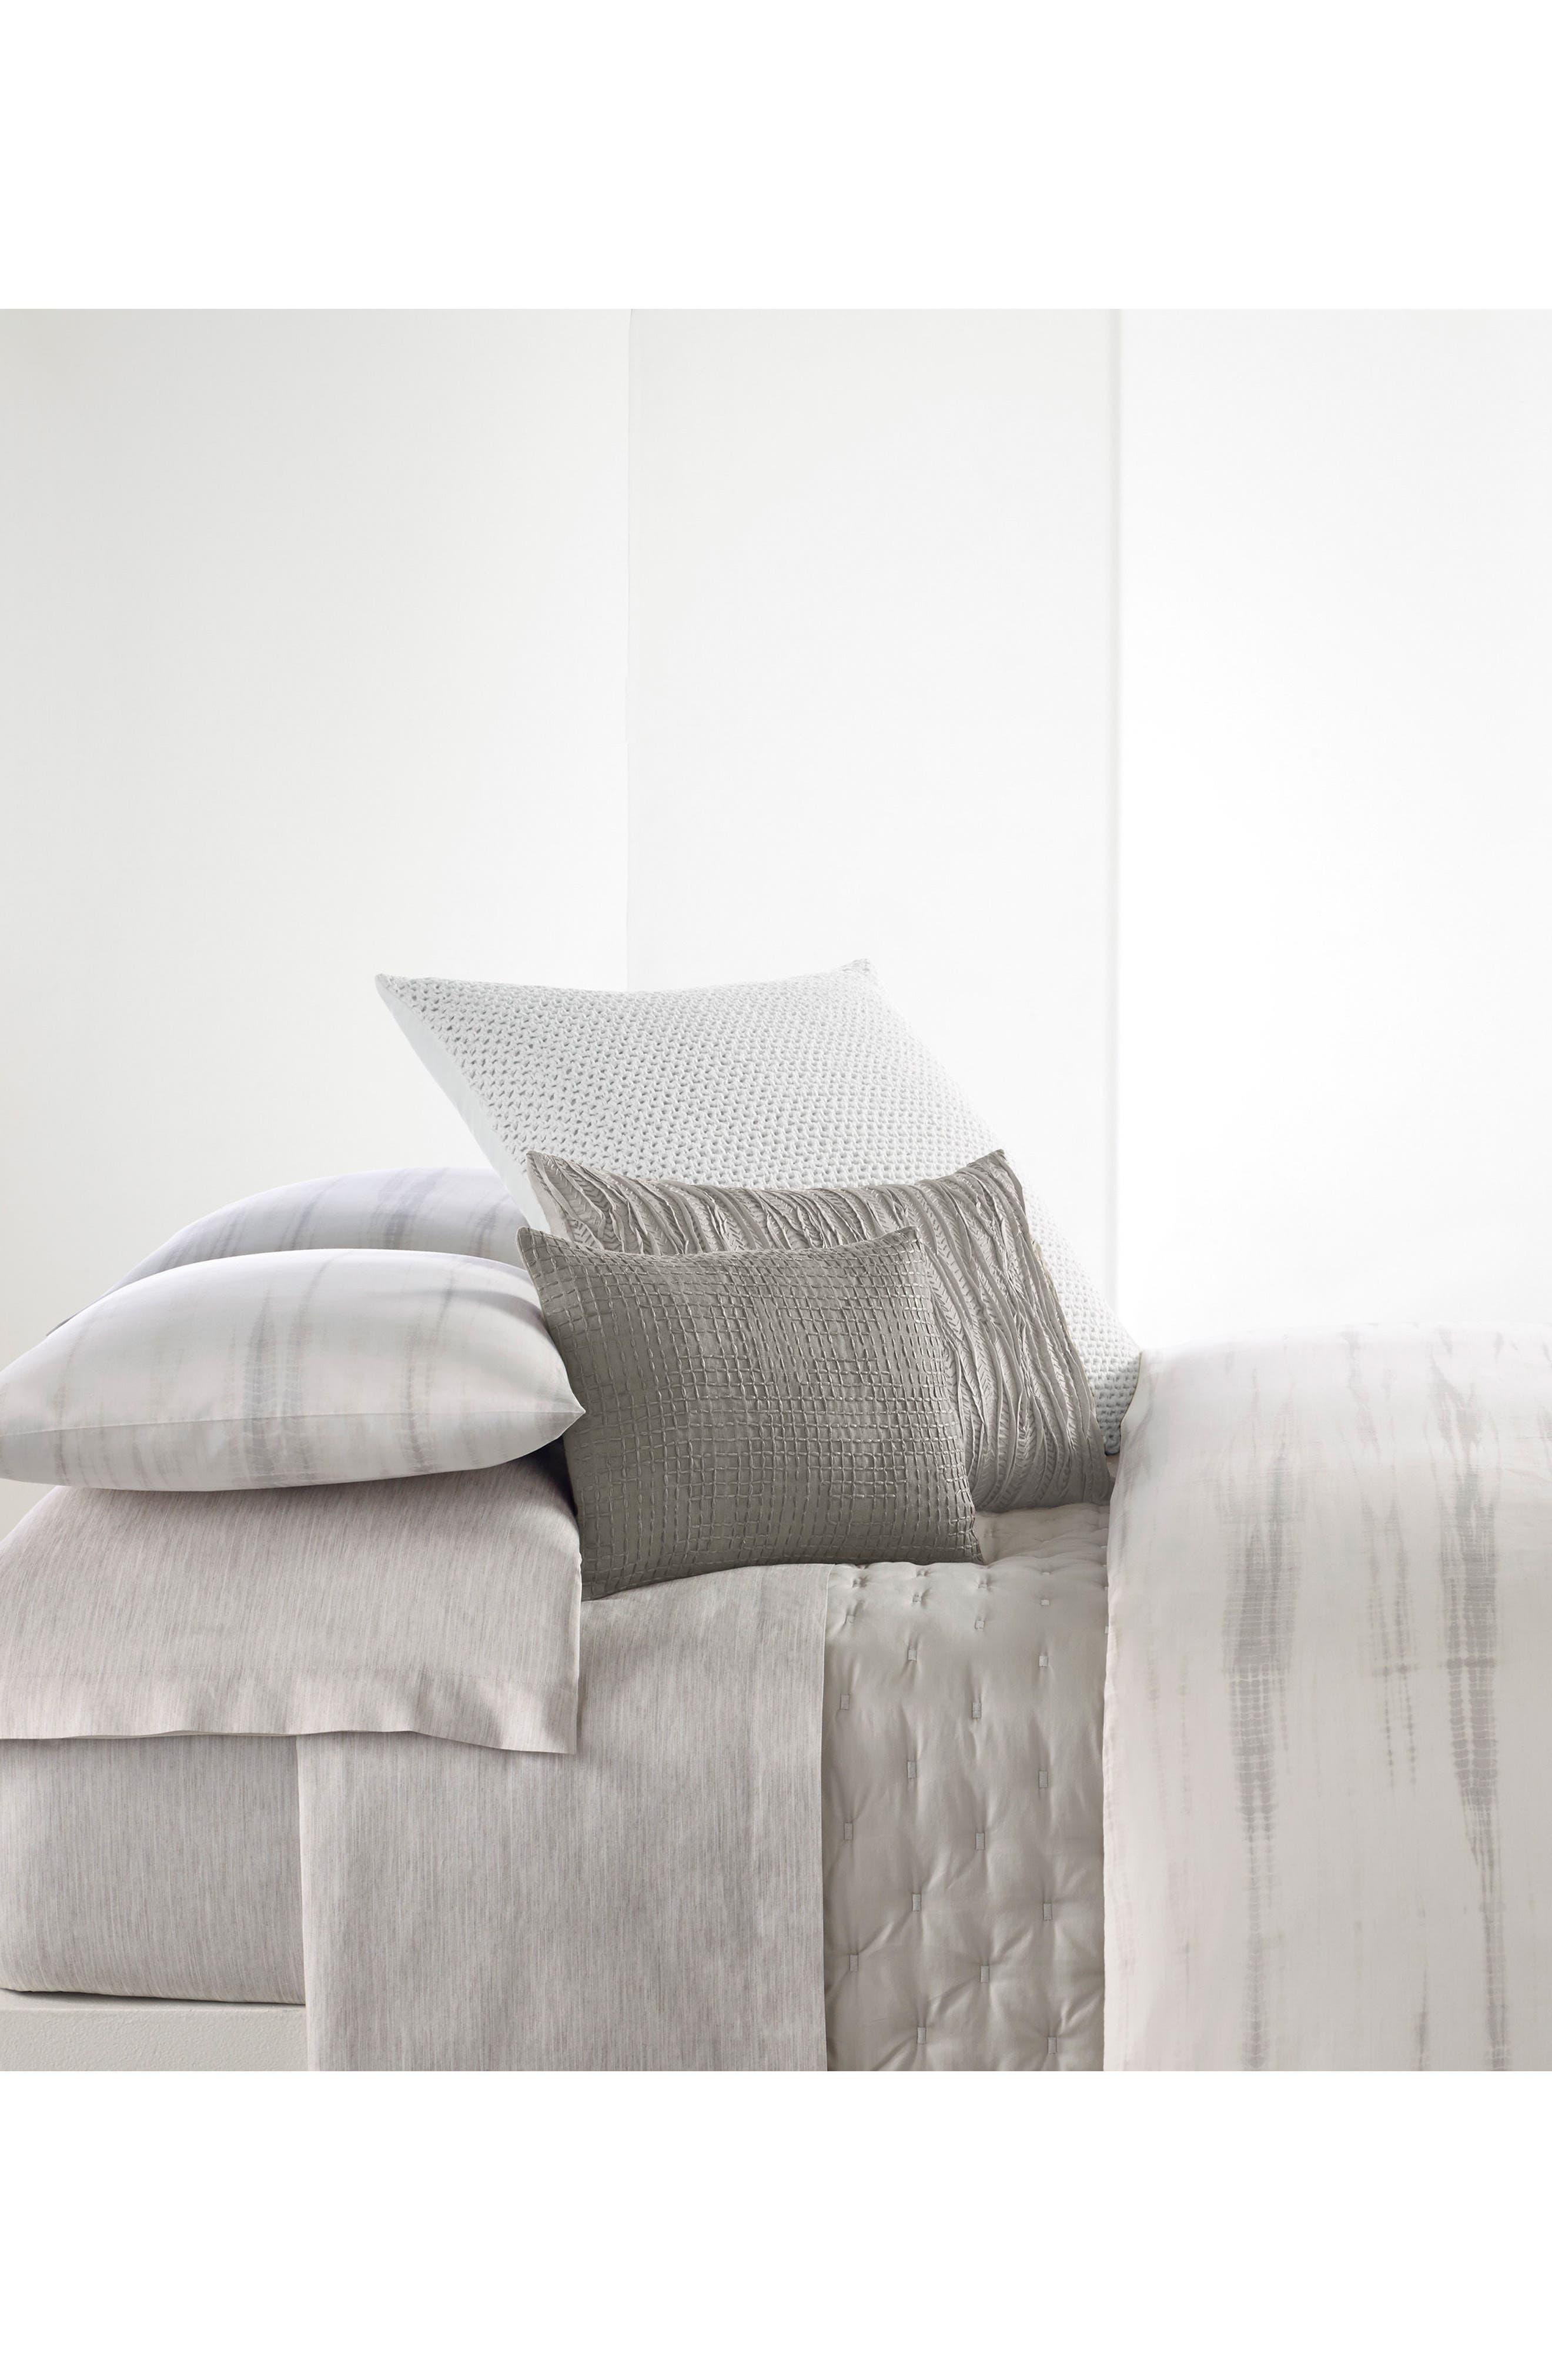 Main Image - Vera Wang Marble Shibori 350 Thread Count Duvet Cover